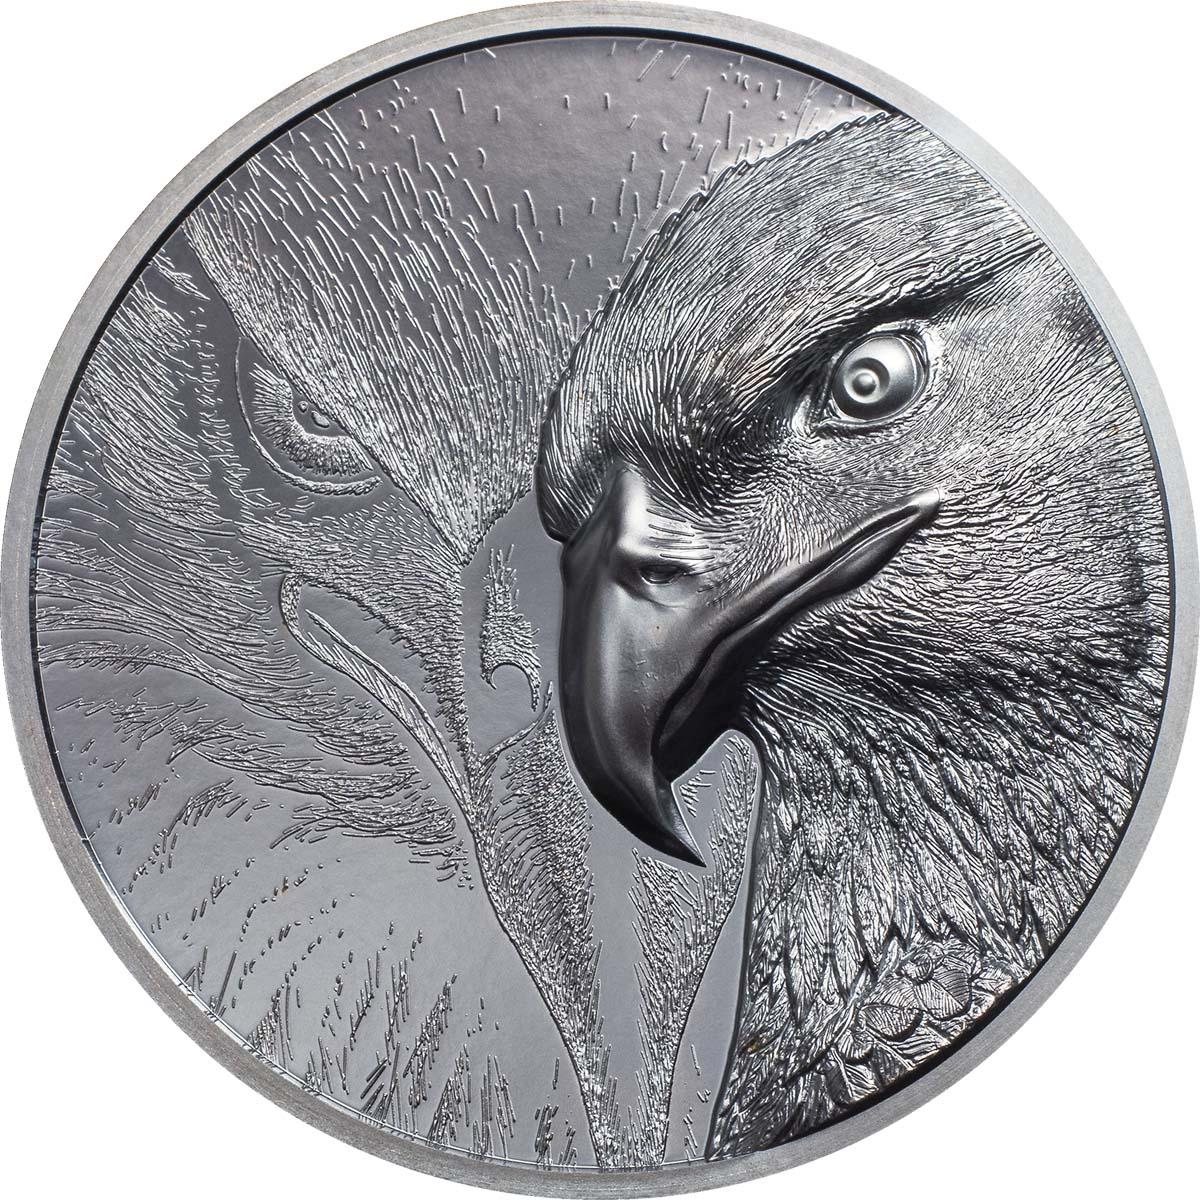 MAJESTIC EAGLE 2020 Mongolia 2oz black proof silver coin